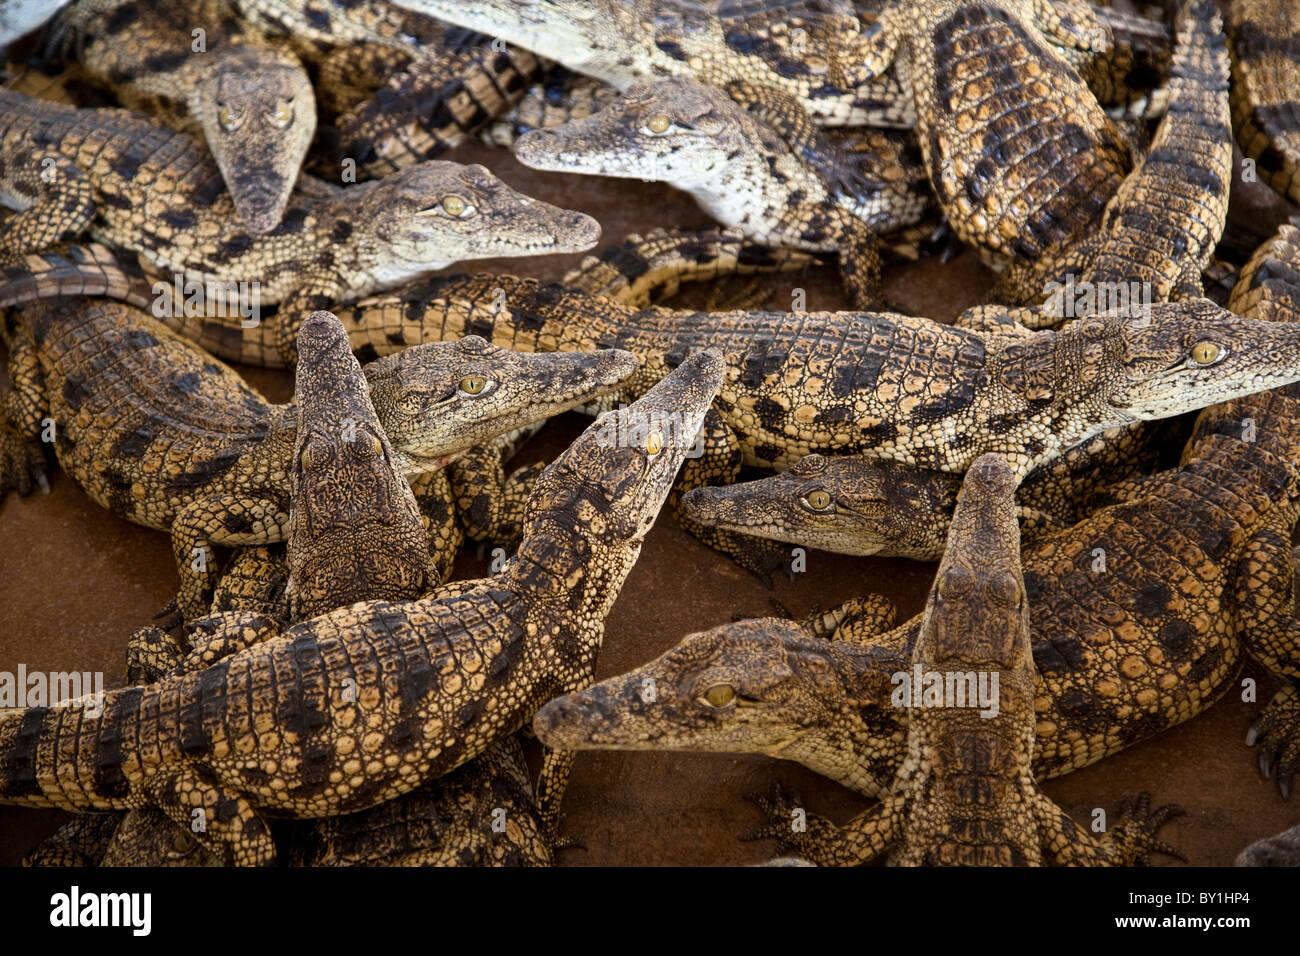 Namibia. Young crocodiles at a crocodile farm. - Stock Image